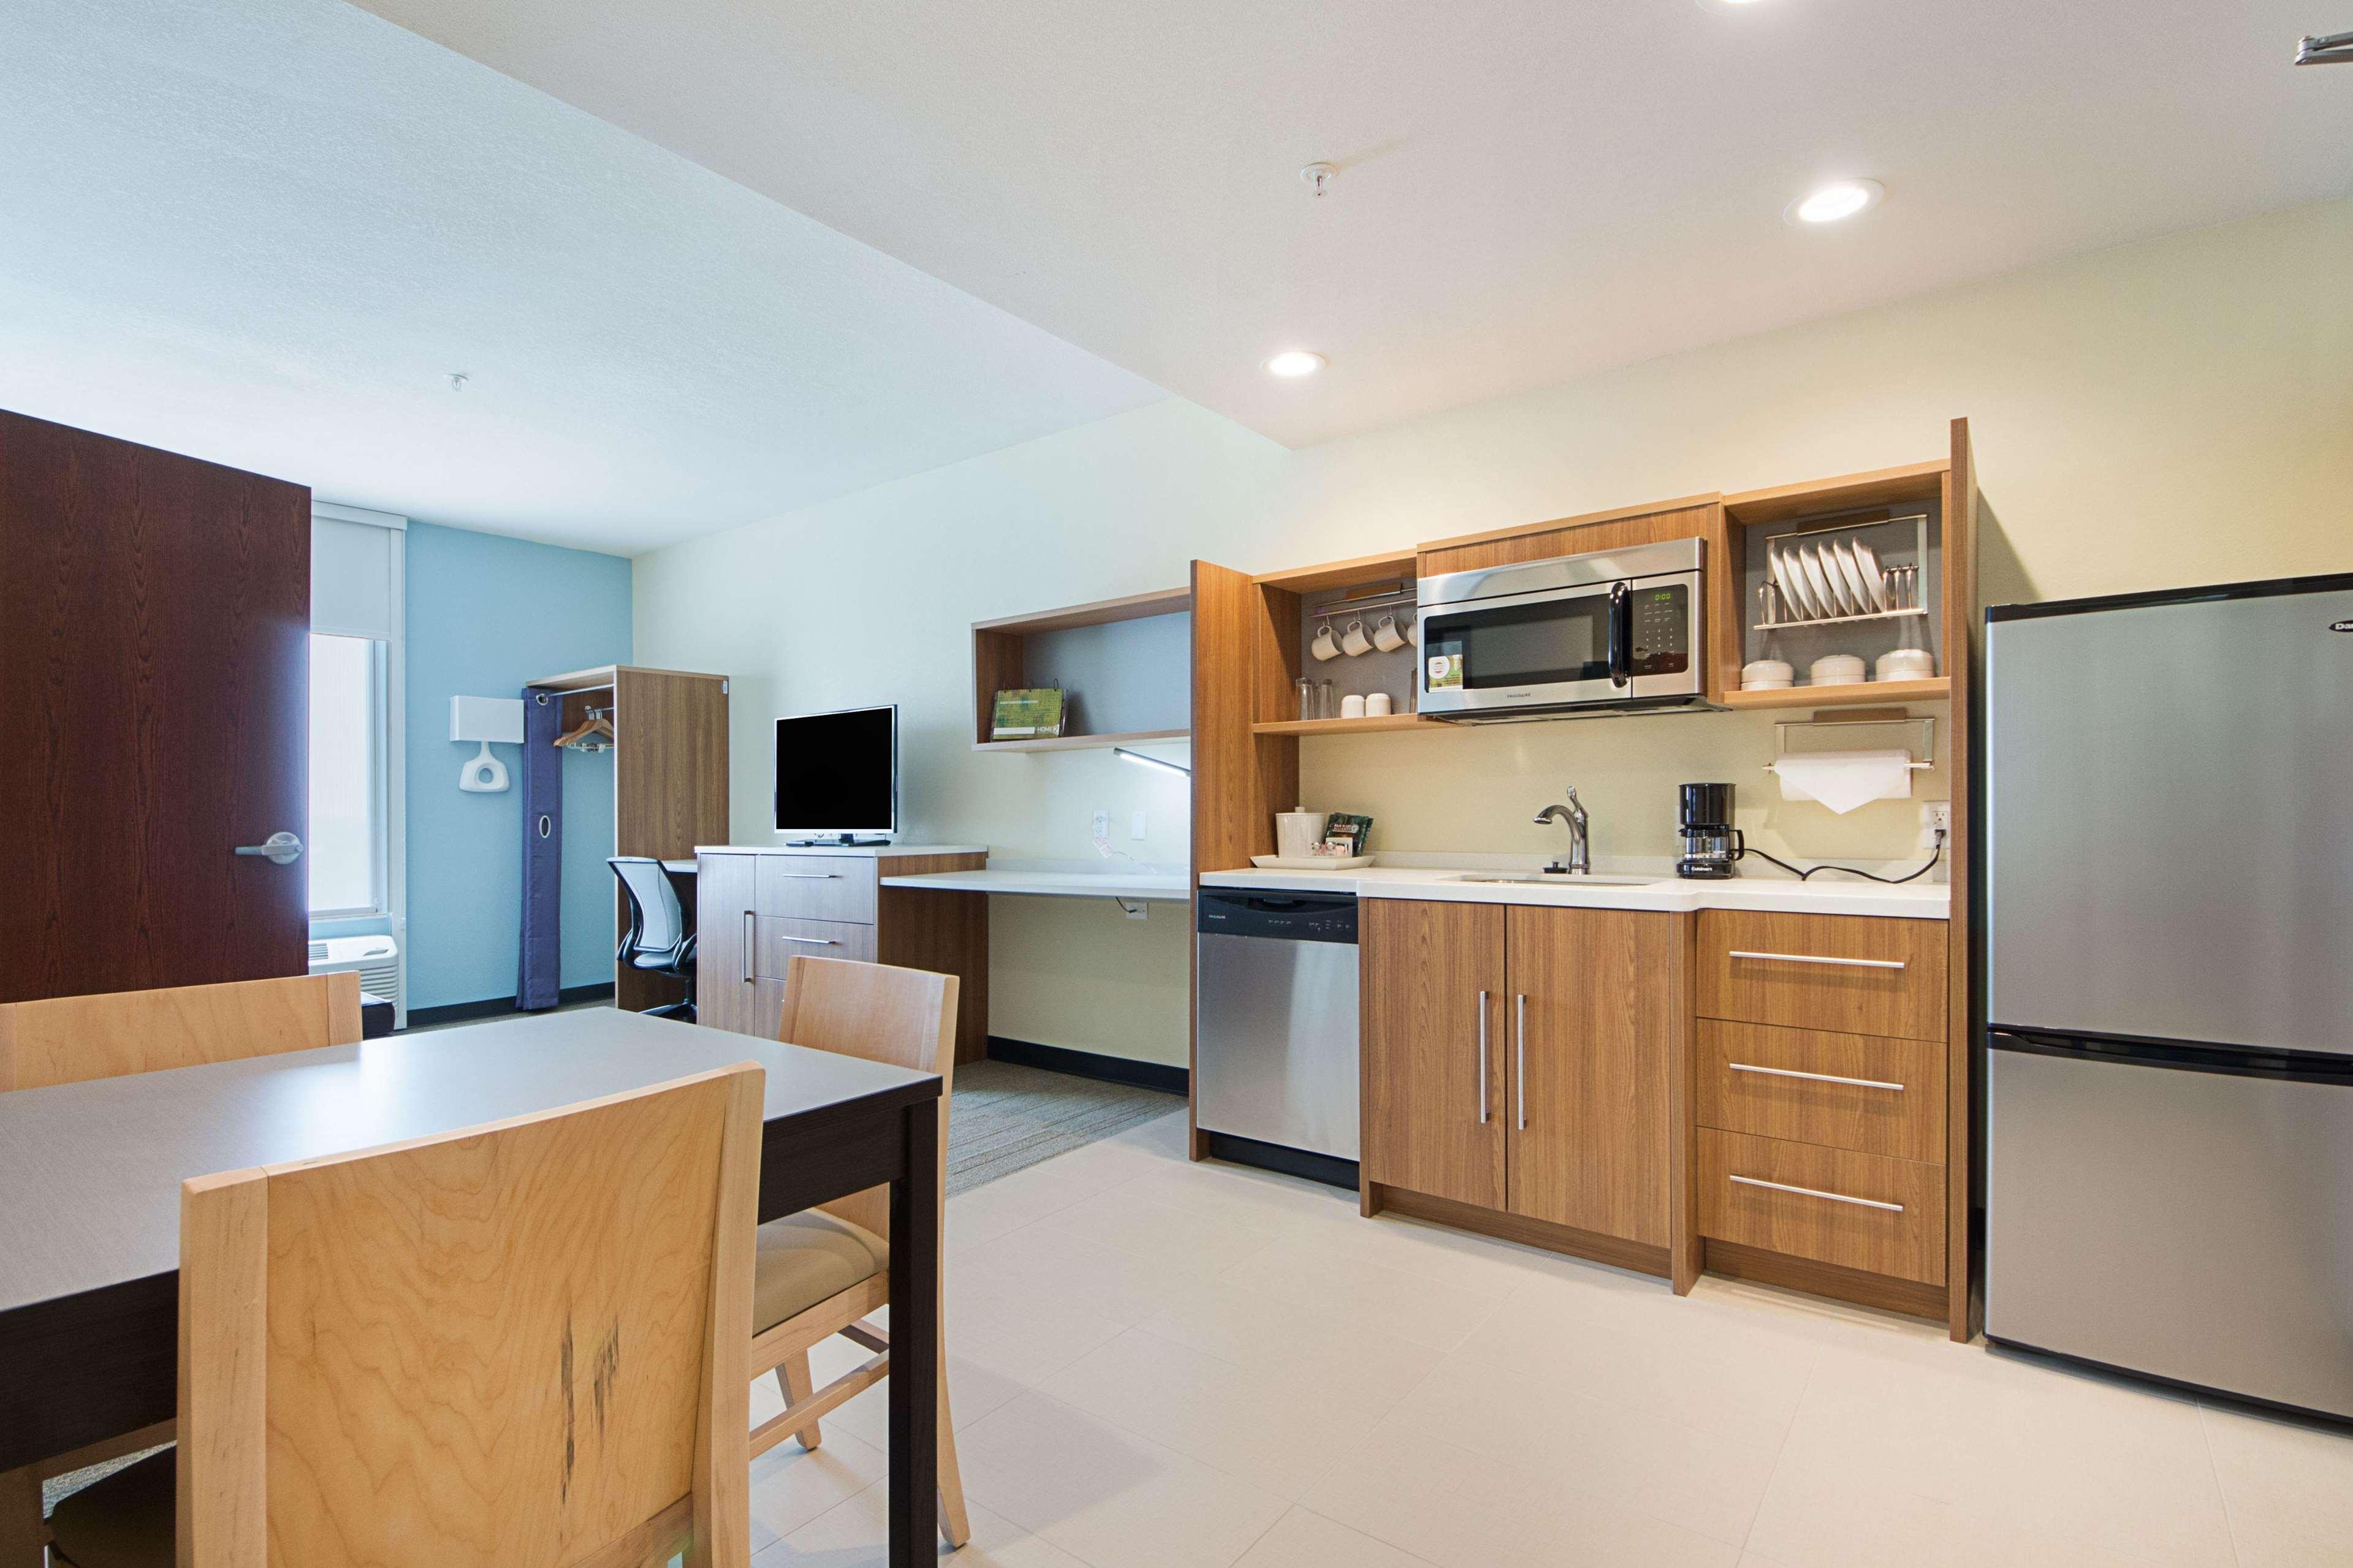 Home 2 Suites by Hilton - Yukon image 33